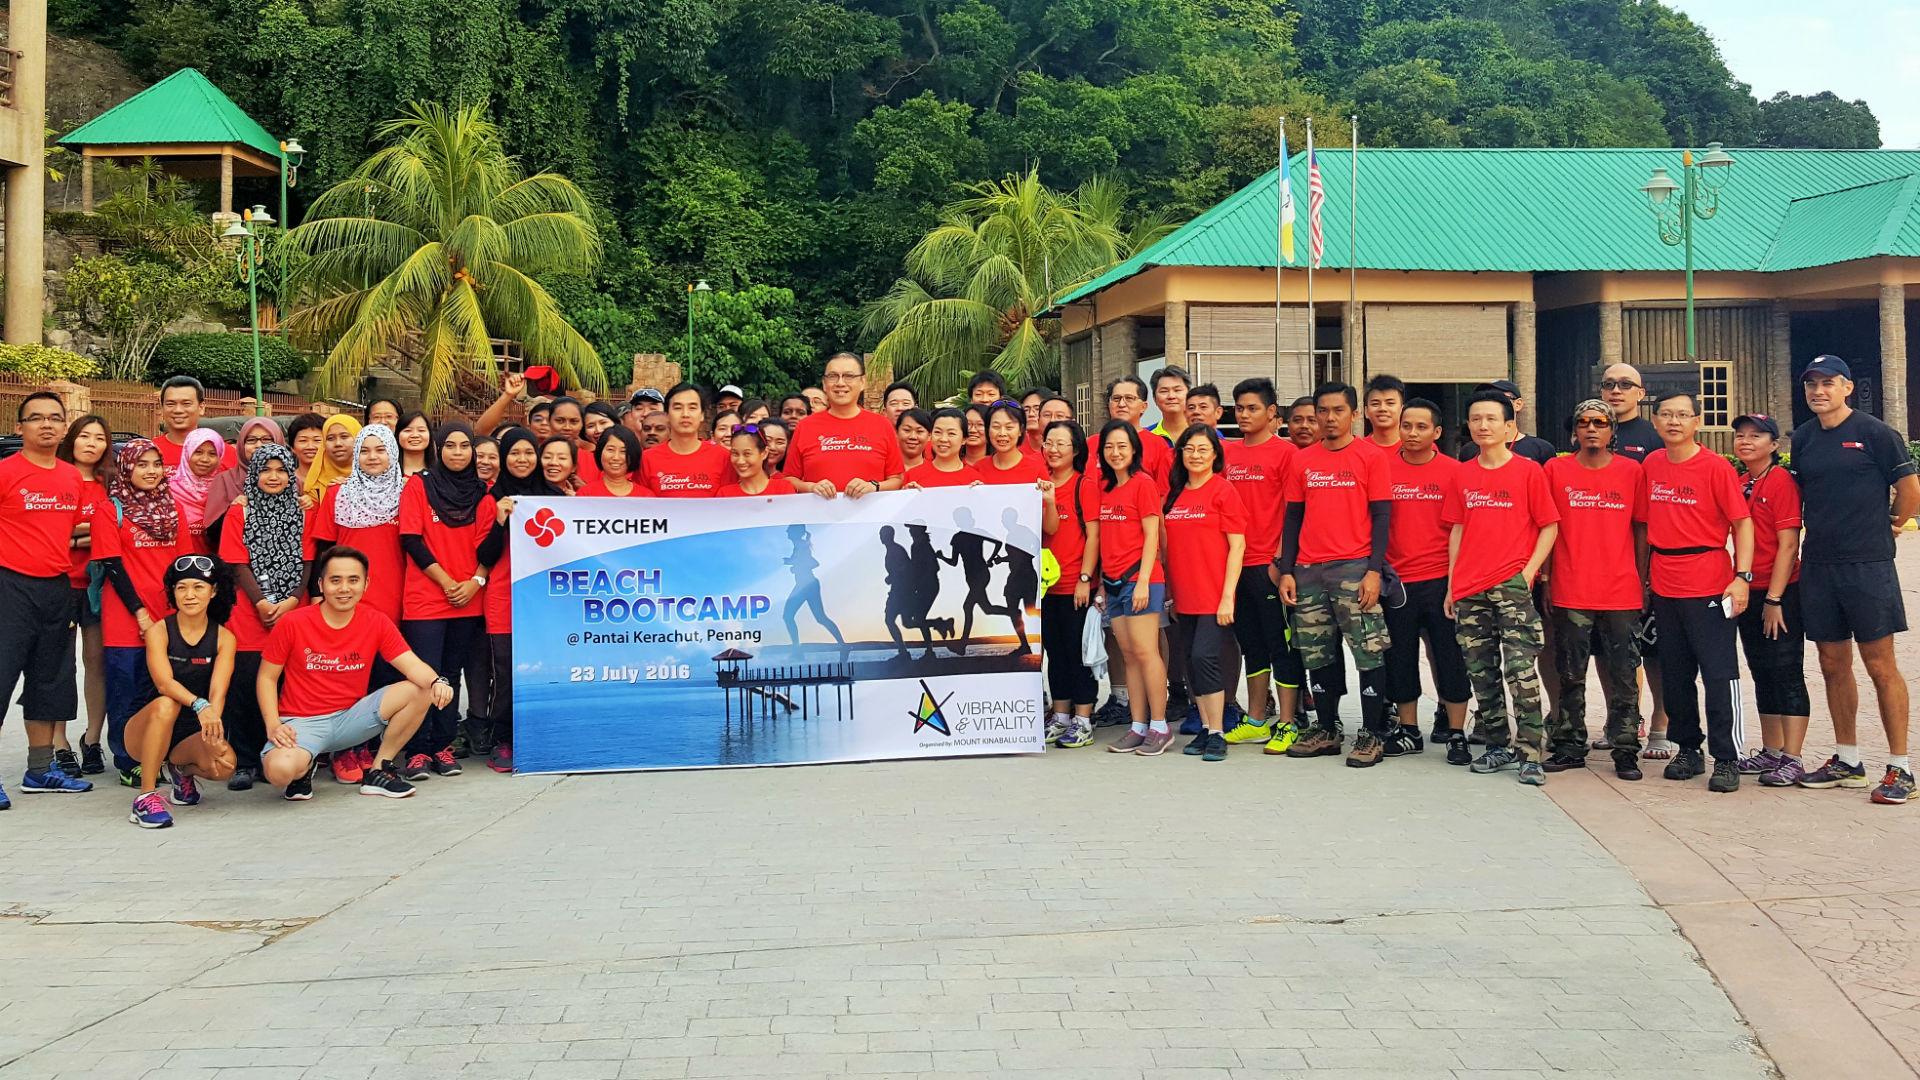 csr-Beach Boot Camp - 23 Jul 2016